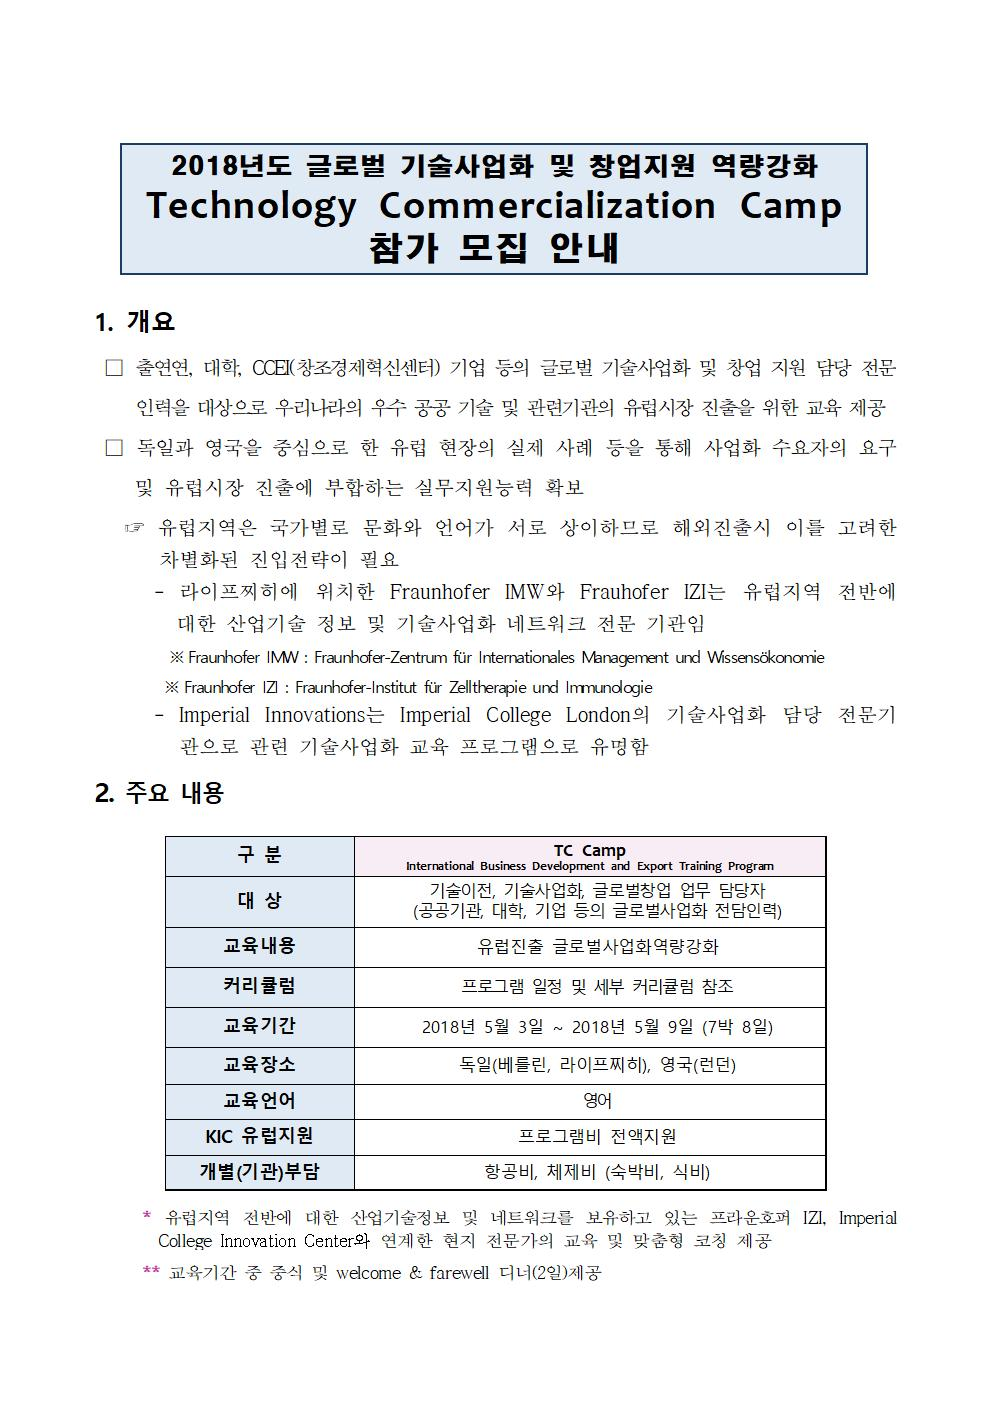 [??????] TC Camp 2018001.jpg